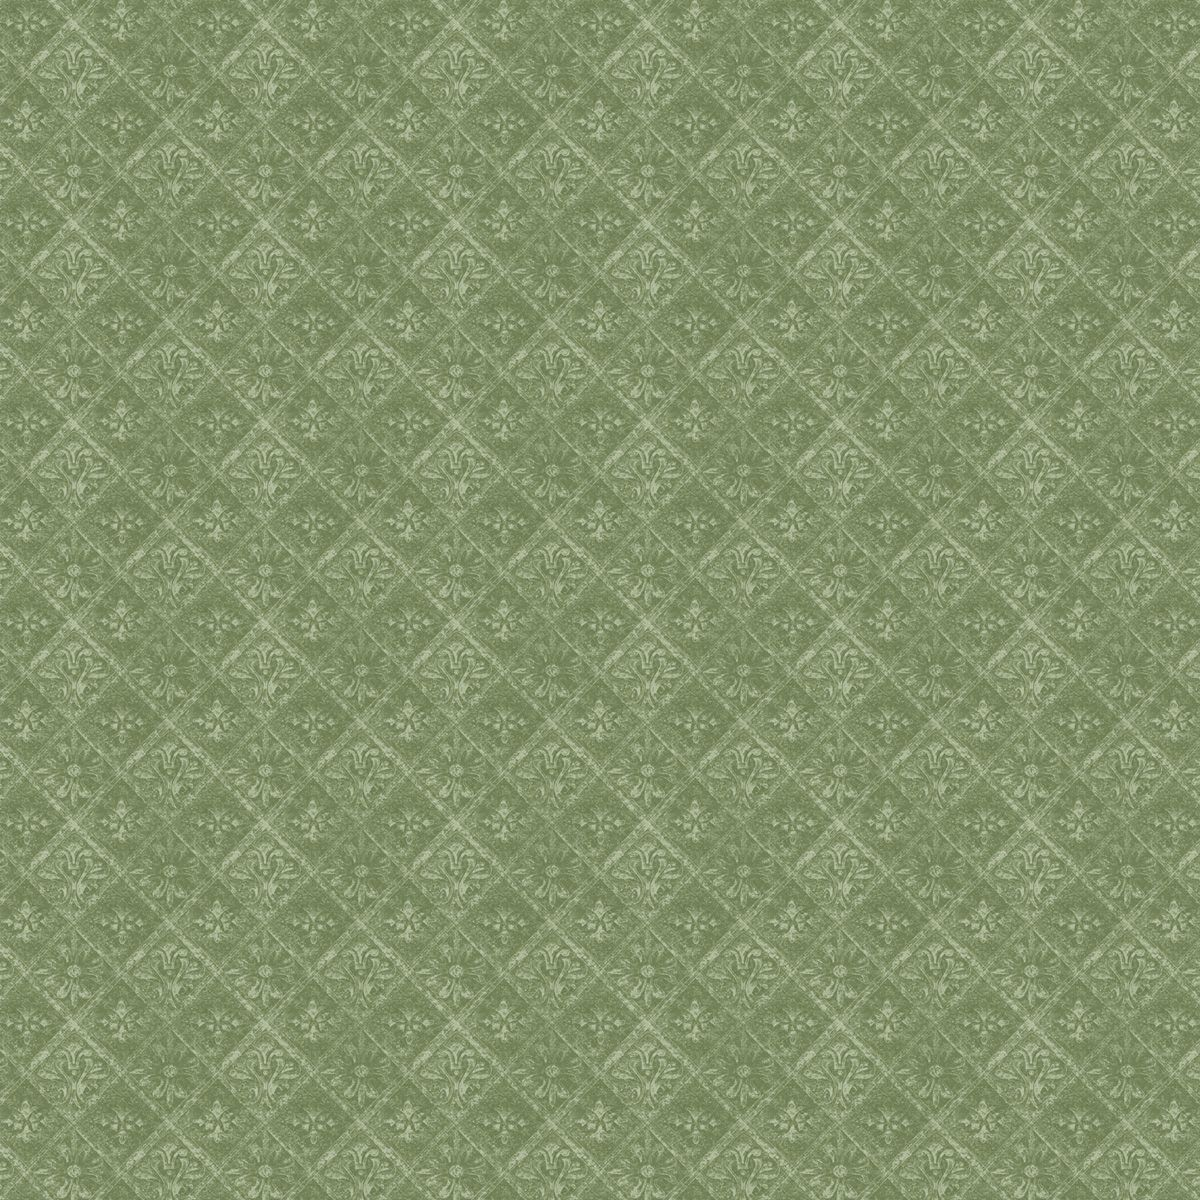 Scrapbook paper dollhouse wallpaper - Free Williamsburg Sage Digi Scrapbook Paper